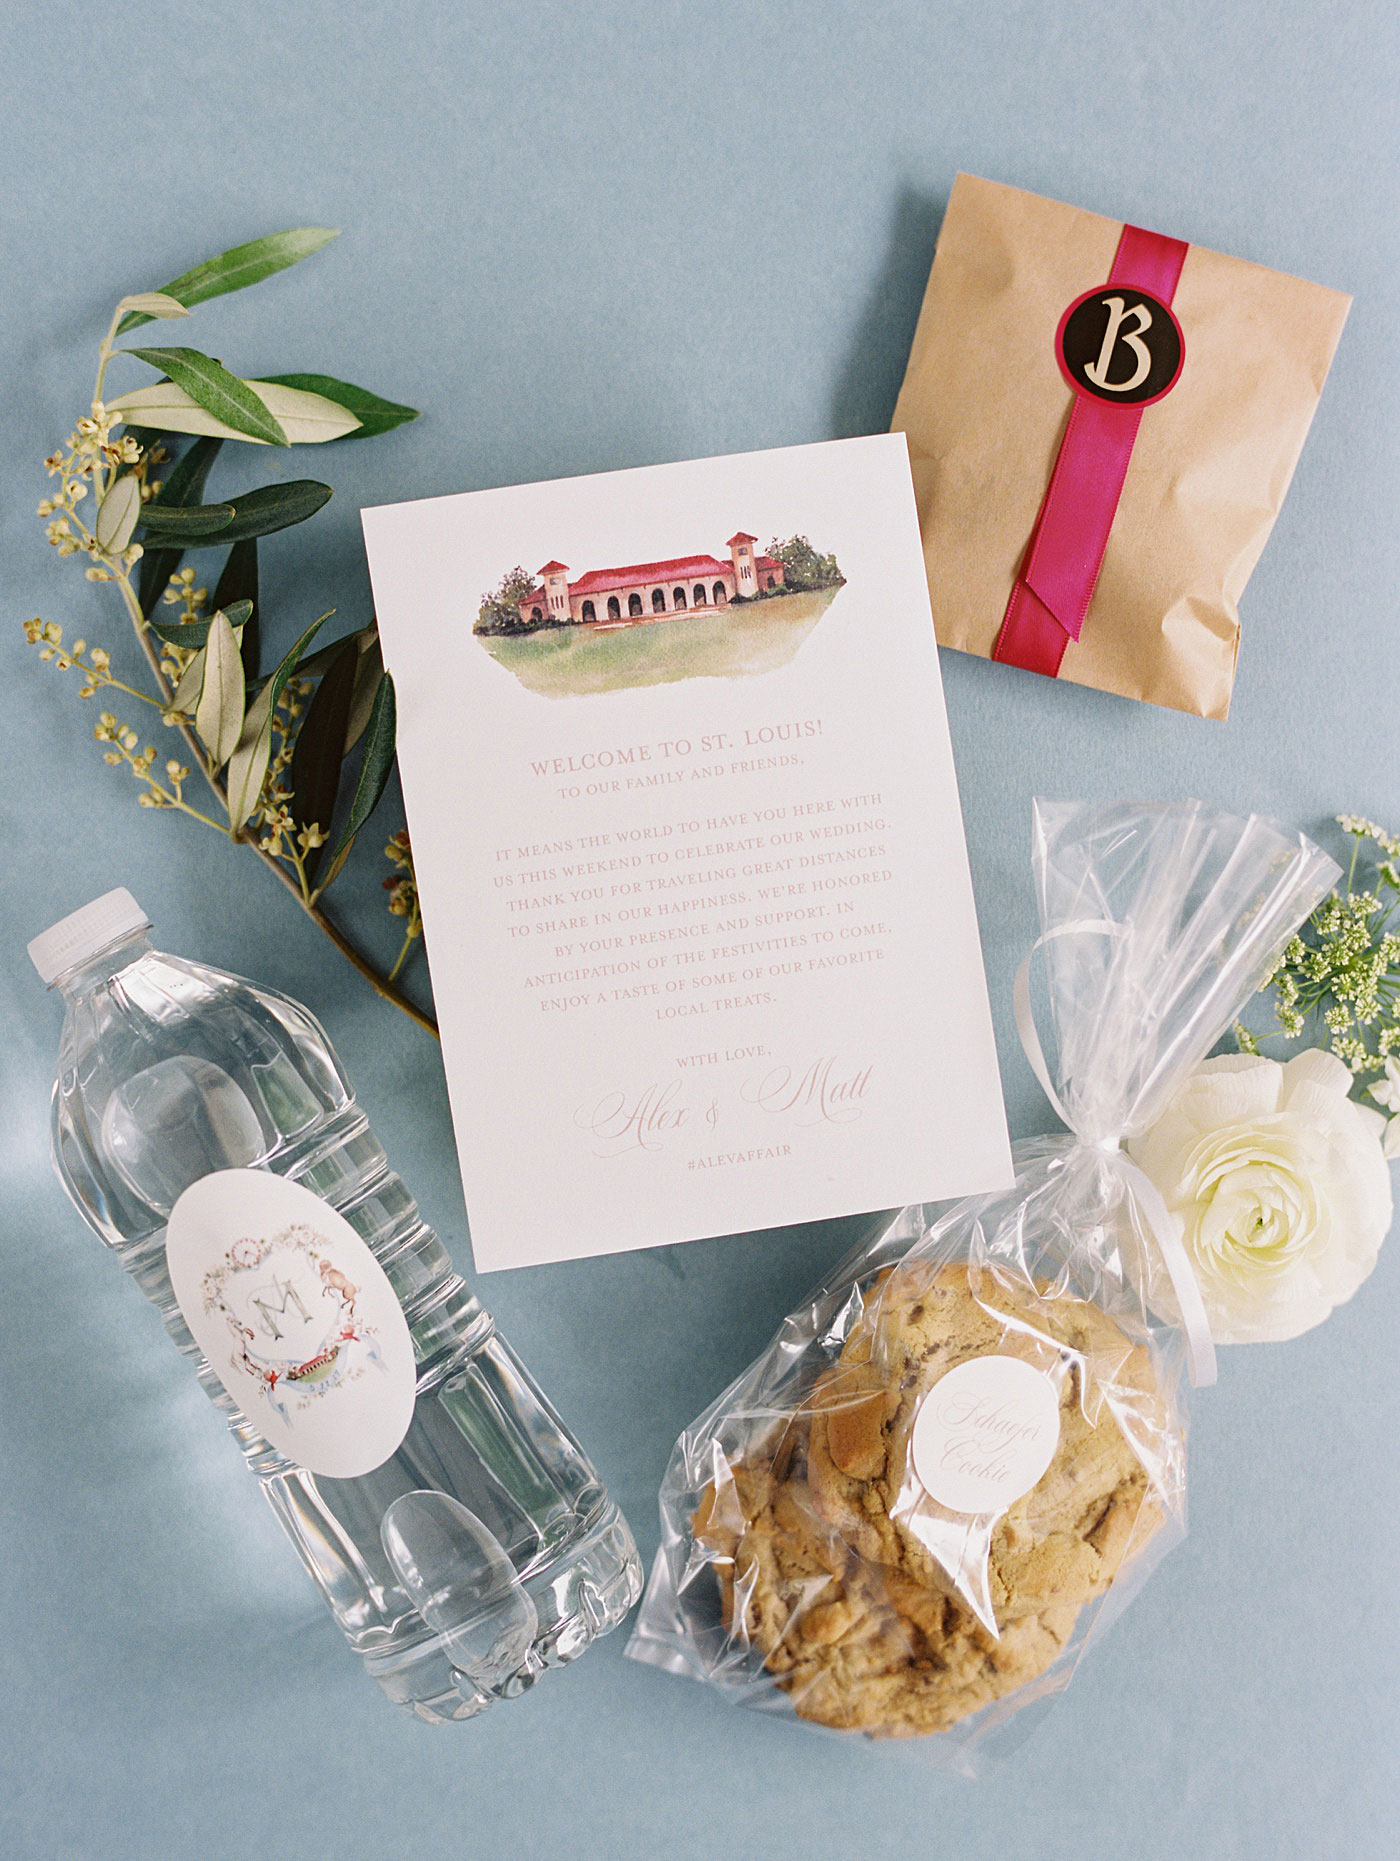 st louis wedding welcome bag